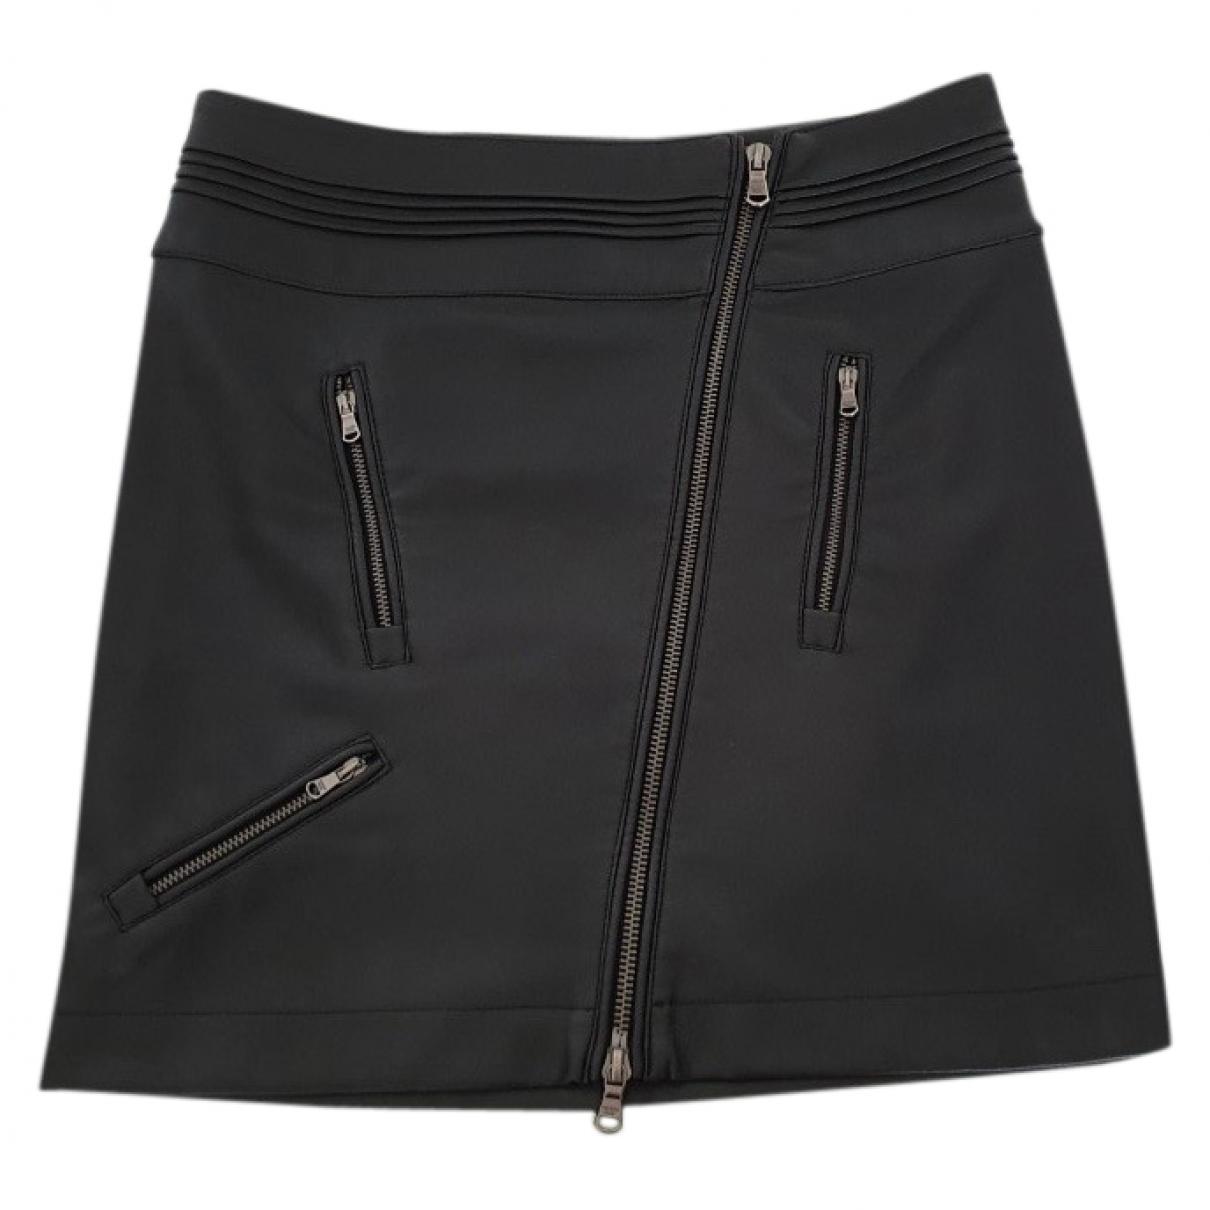 Patrizia Pepe \N Black Leather skirt for Women 40 IT